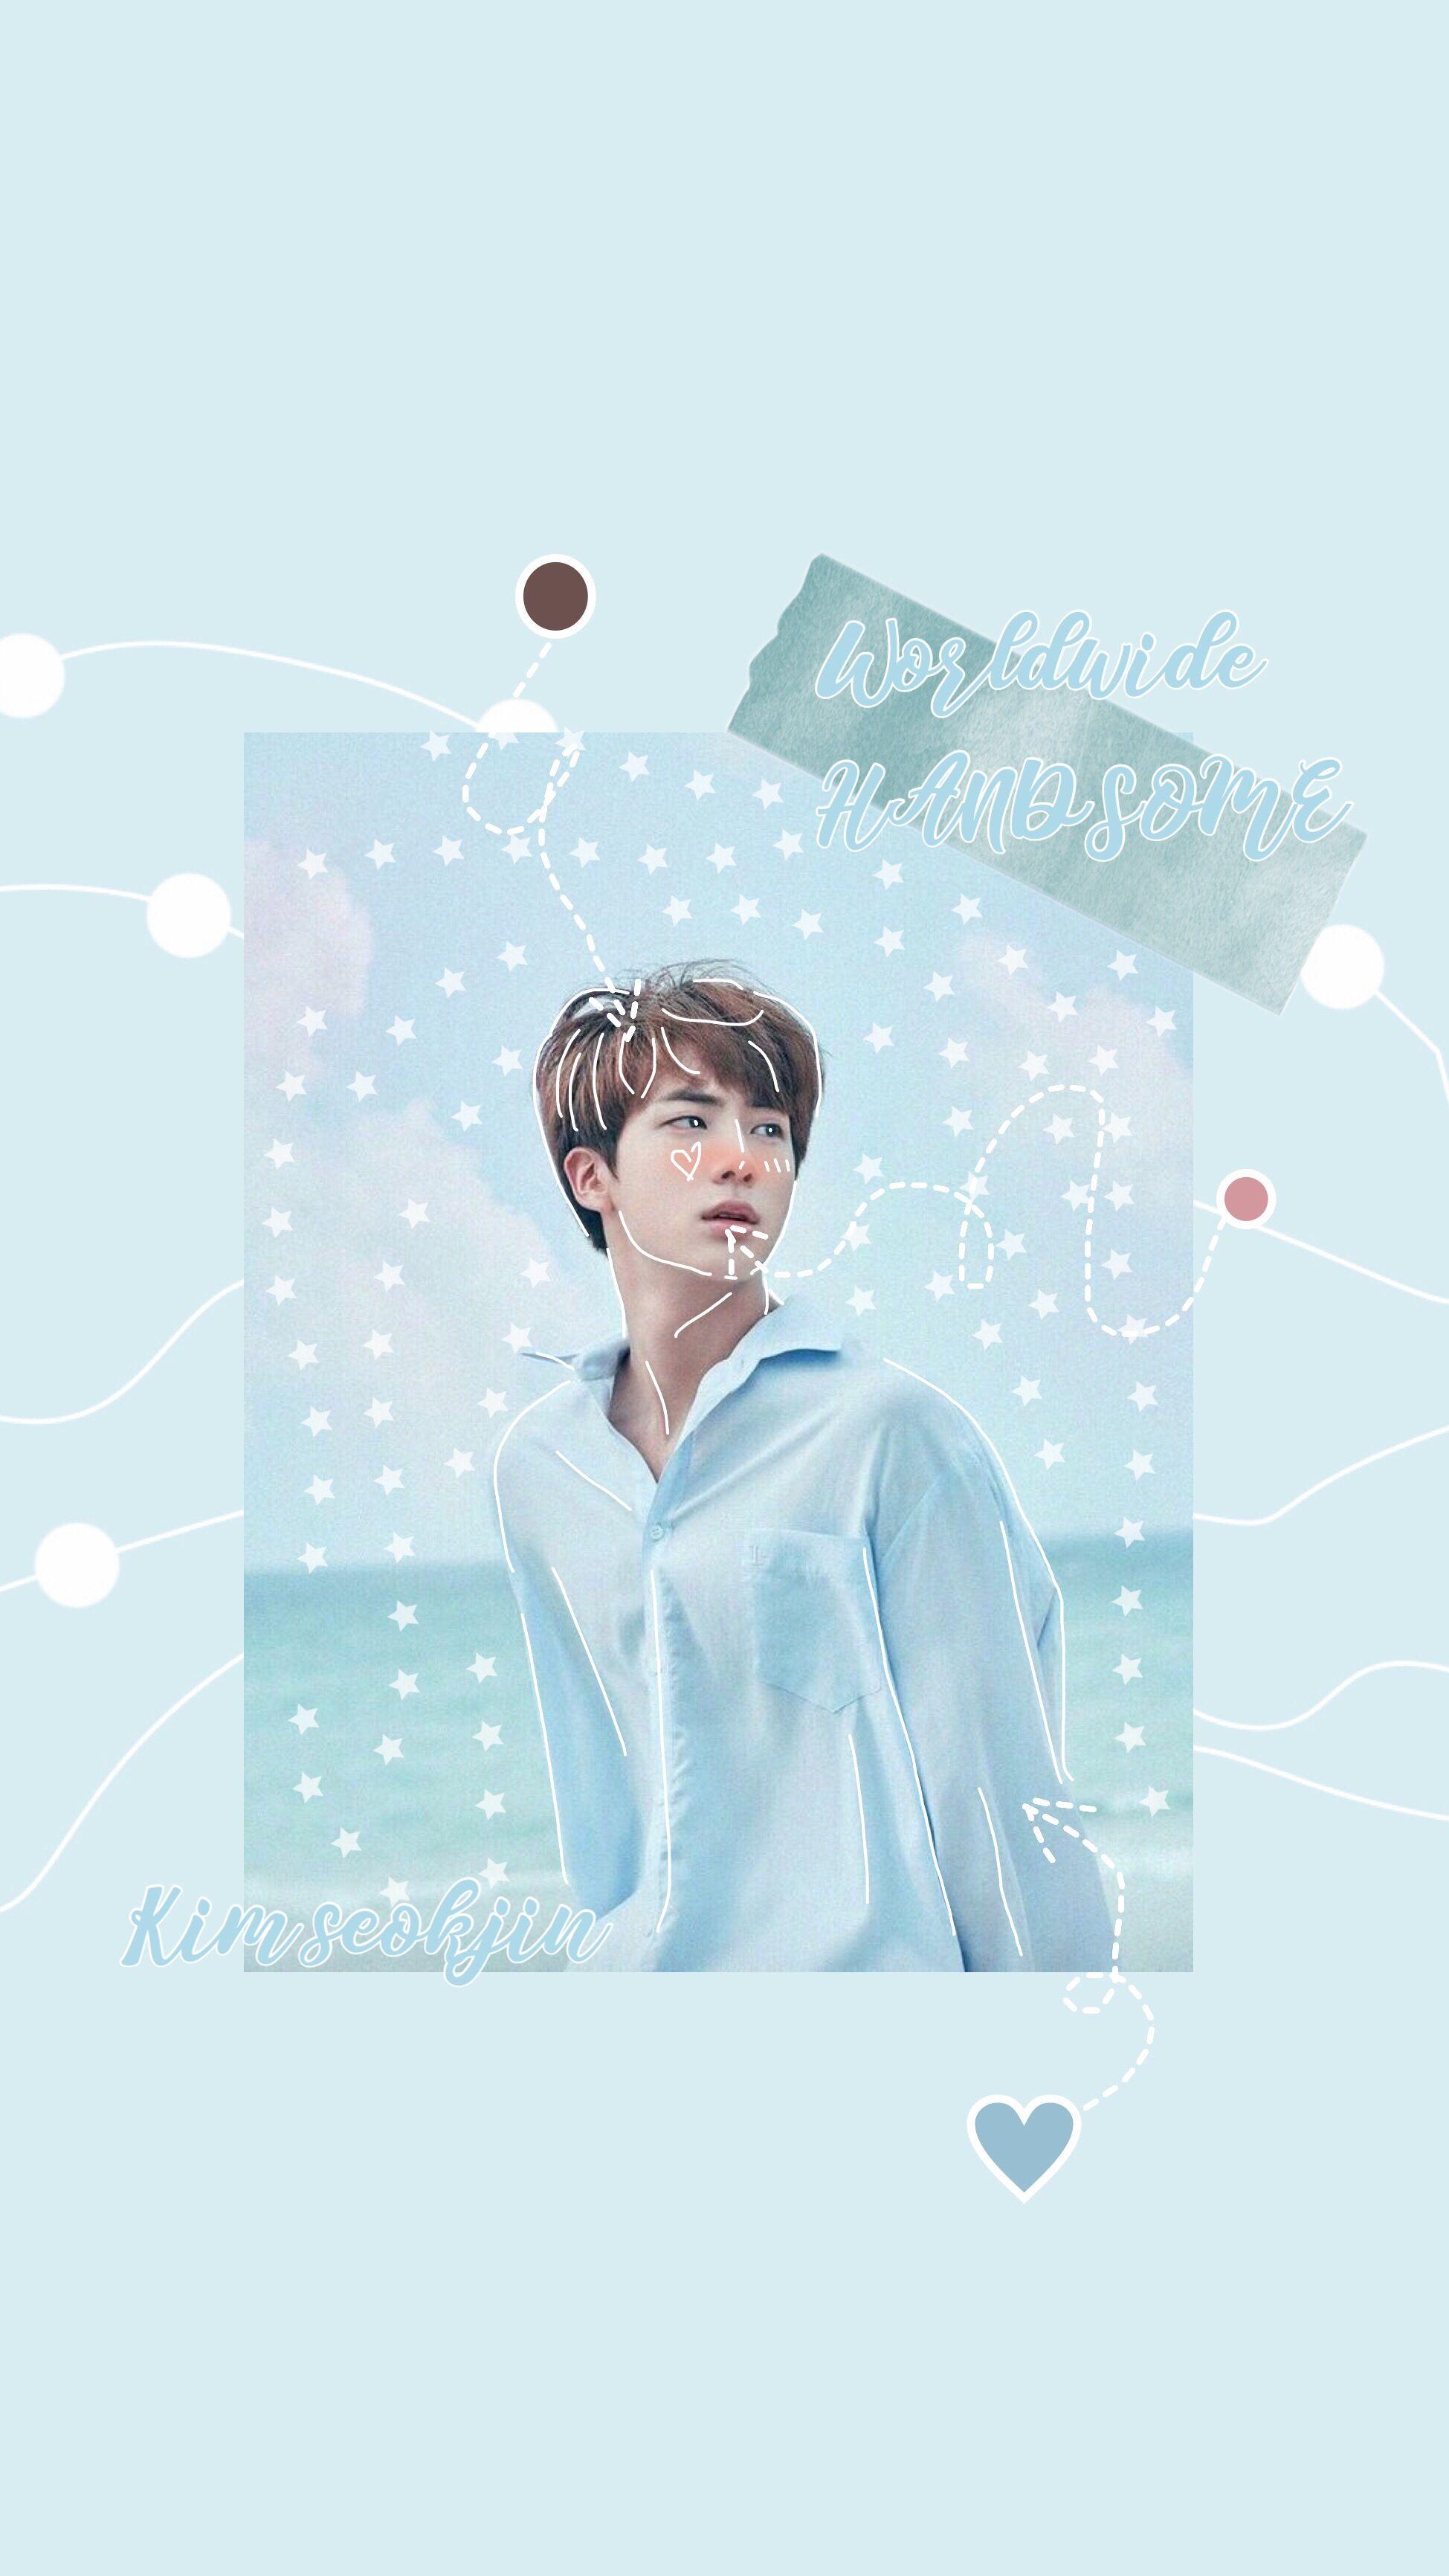 Kim Seokjin Aesthetic Wallpapers posted ...